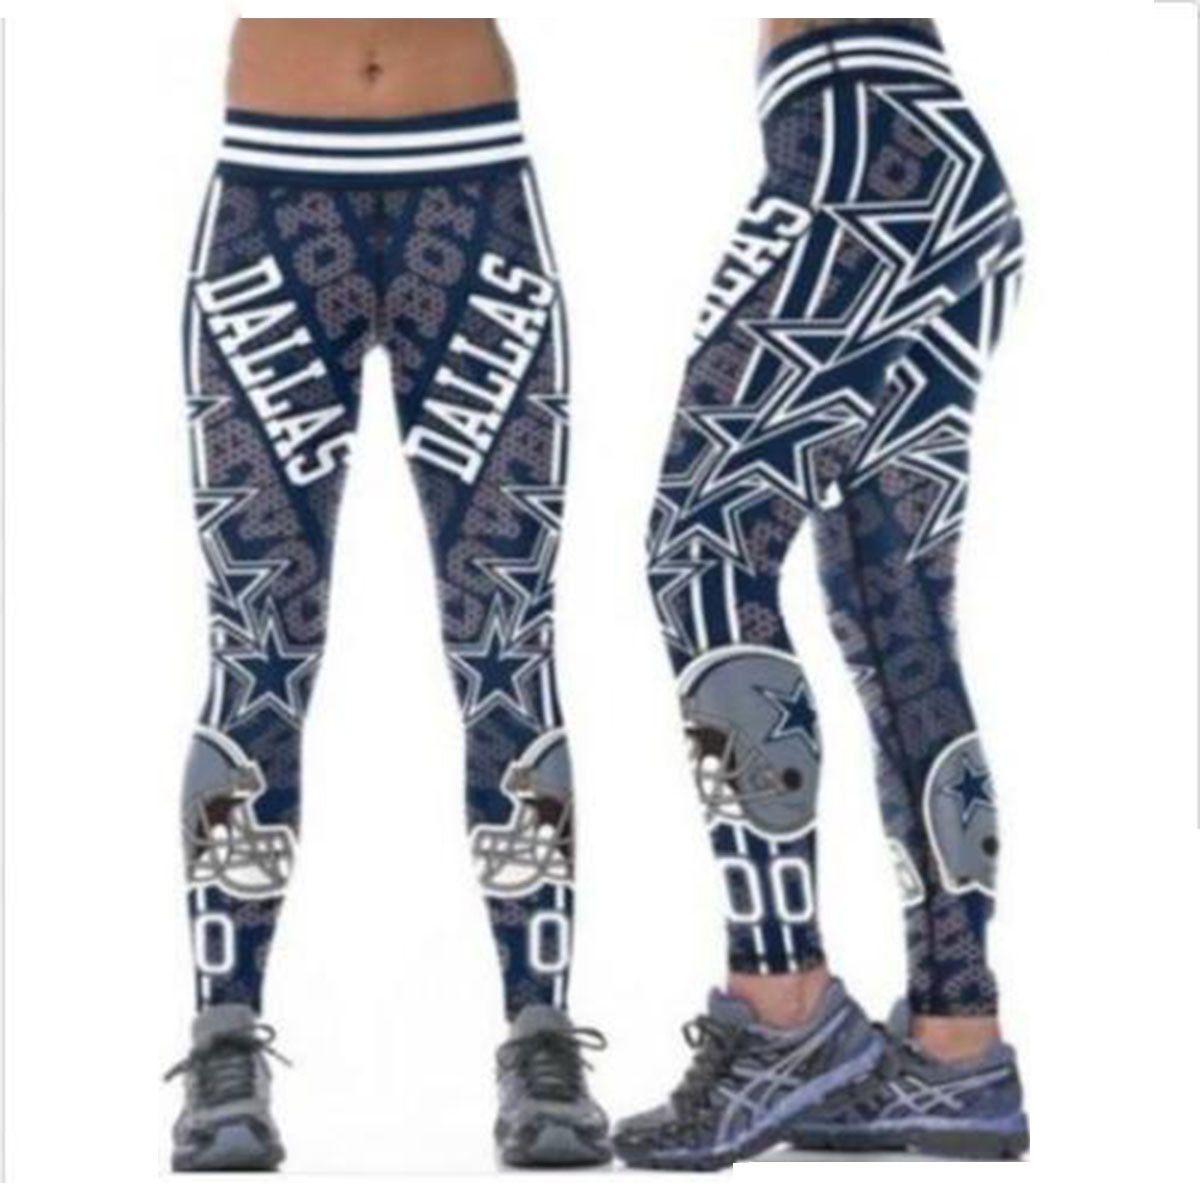 new concept 03b89 f9563 S-4XL Multi-Color Women Legging Dallas Cowboys printed high waist wide belt  running fitness tights yoga pants S-4XL